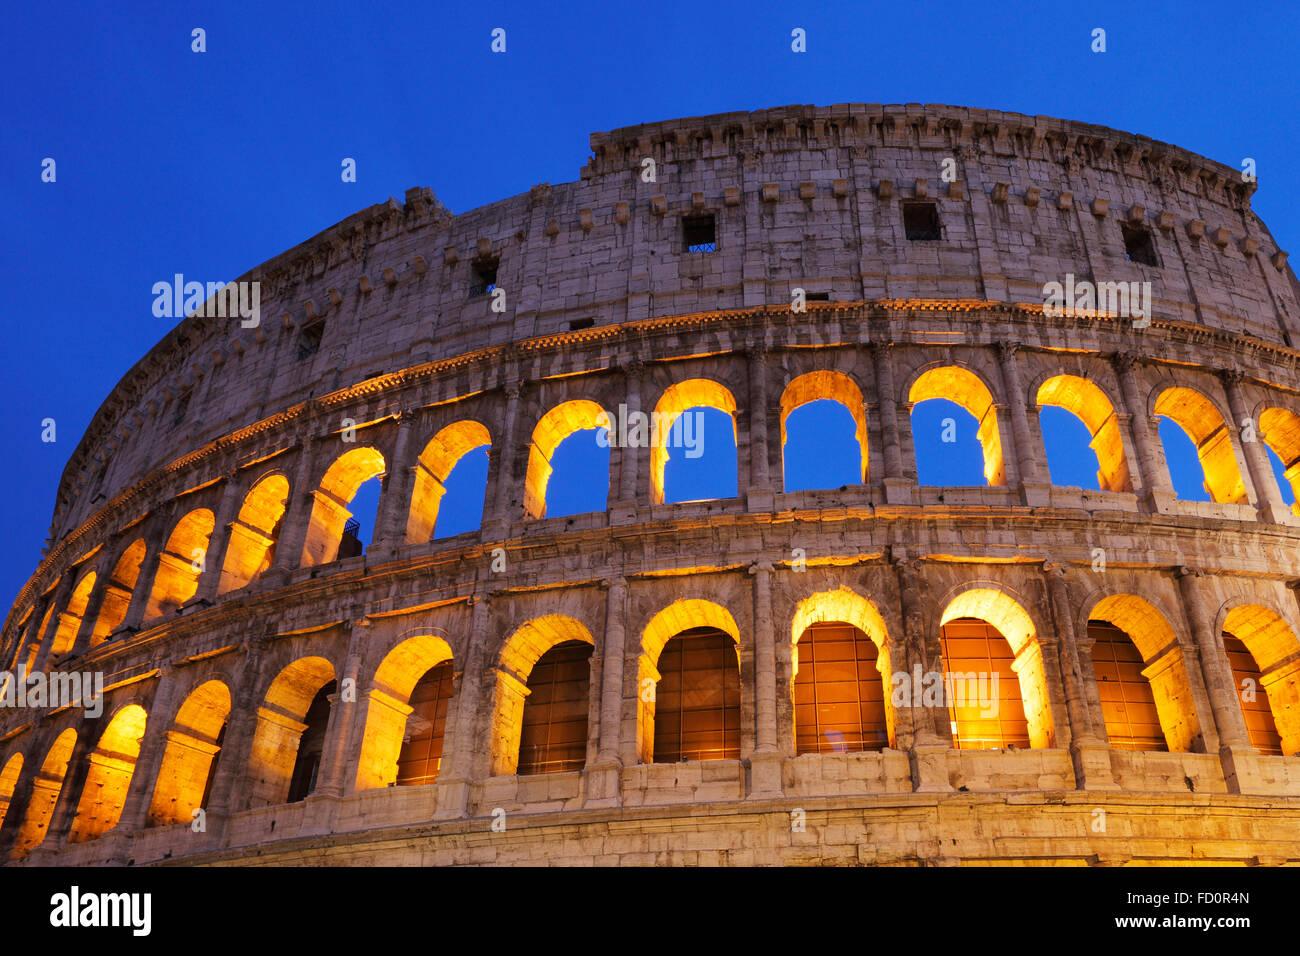 The Colosseum or Coliseum or Flavian Amphitheatre in Rome, Italy;  (Latin: Amphitheatrum Flavium); Anfiteatro Flavio or Colosseo Stock Photo